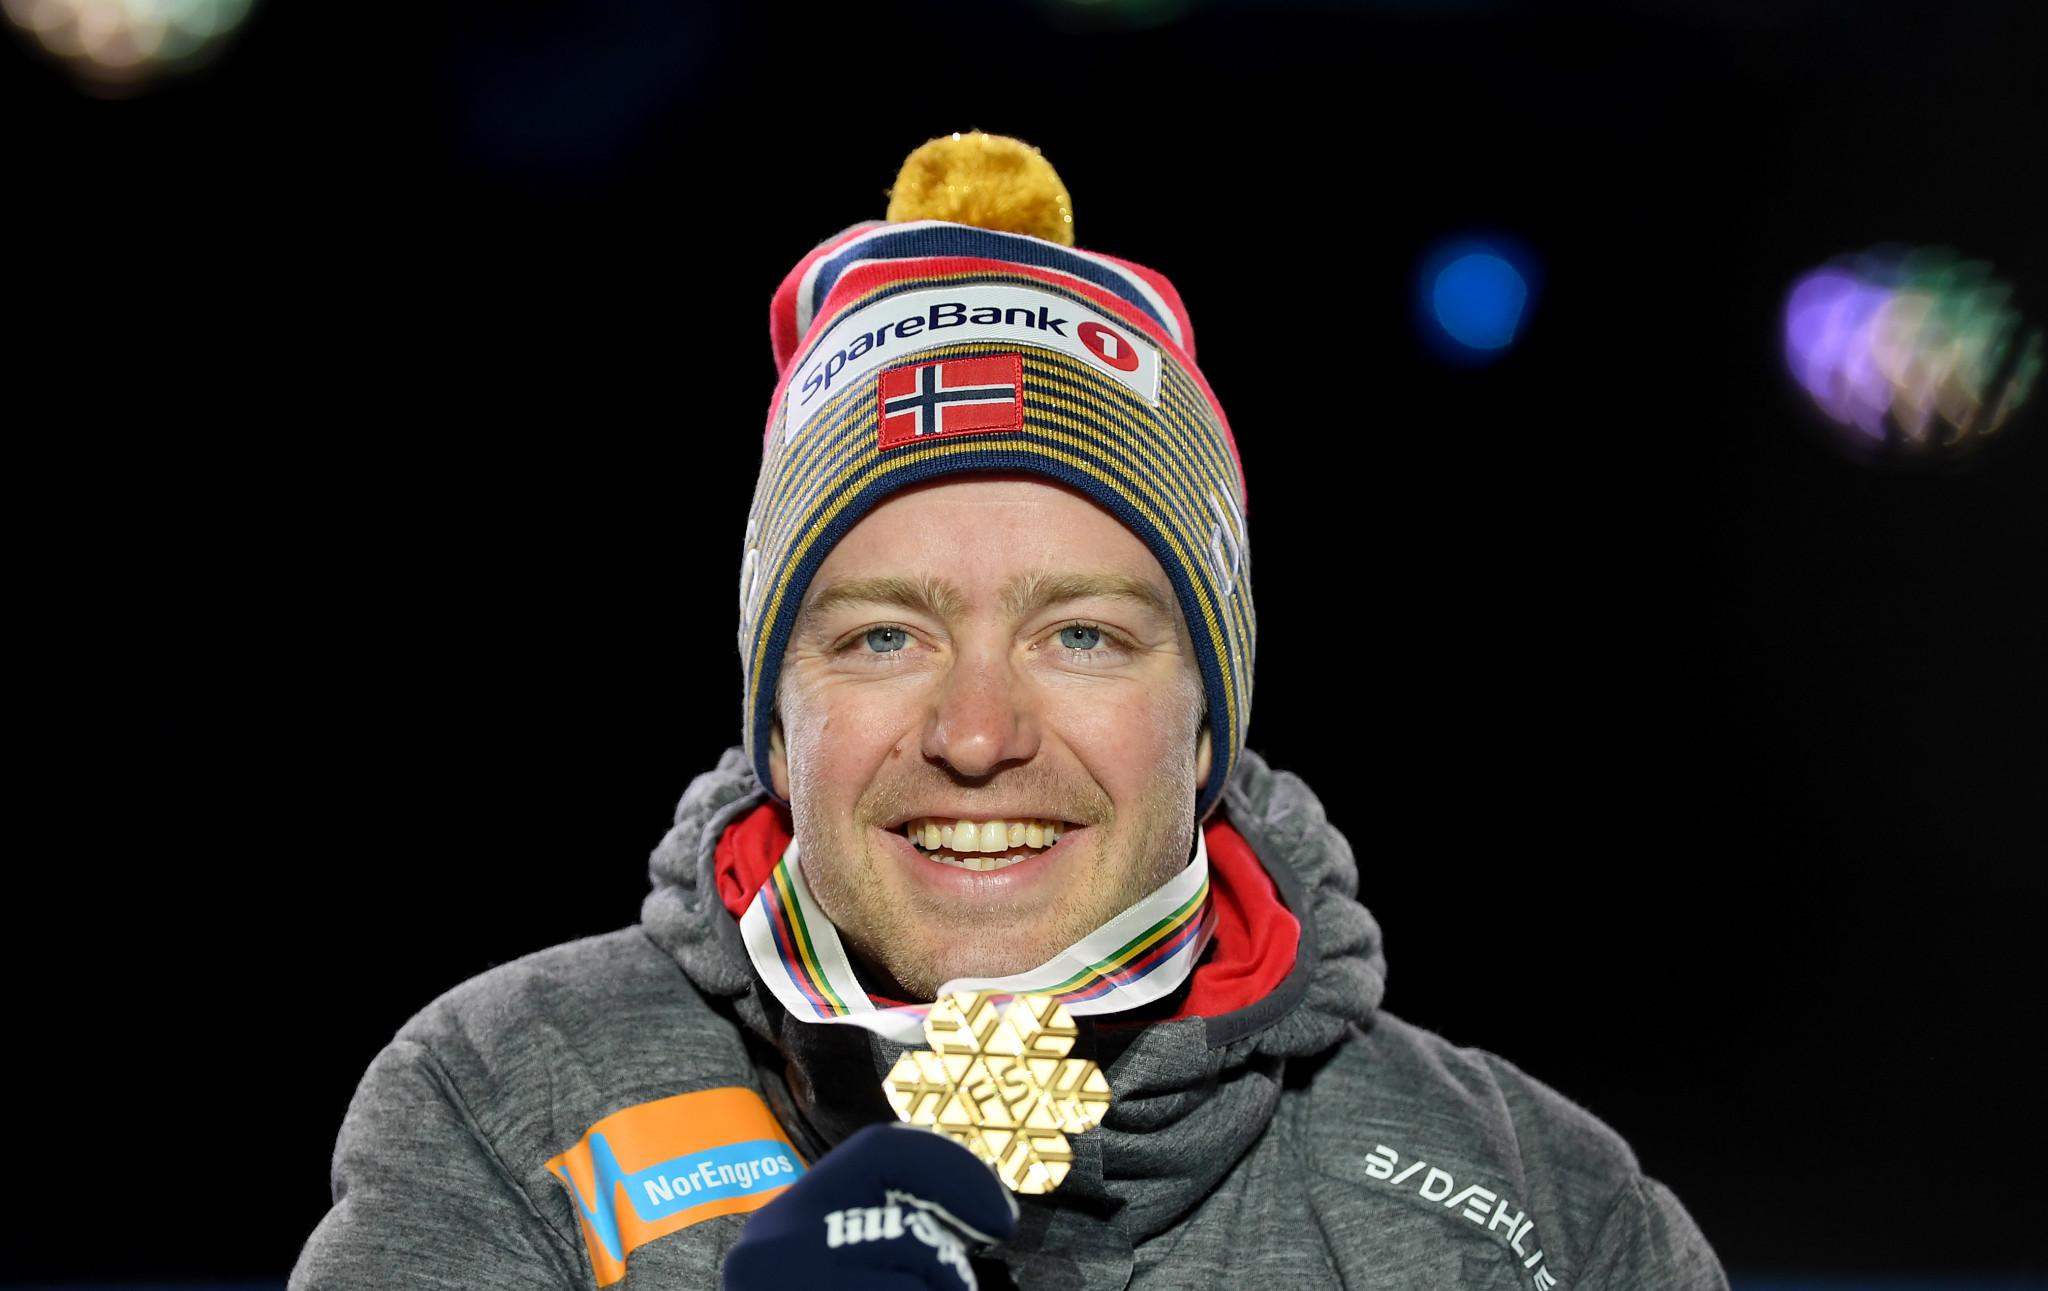 Norway celebrate double skiathlon gold as Eisenbichler earns ski jumping crown at FIS Nordic World Ski Championships